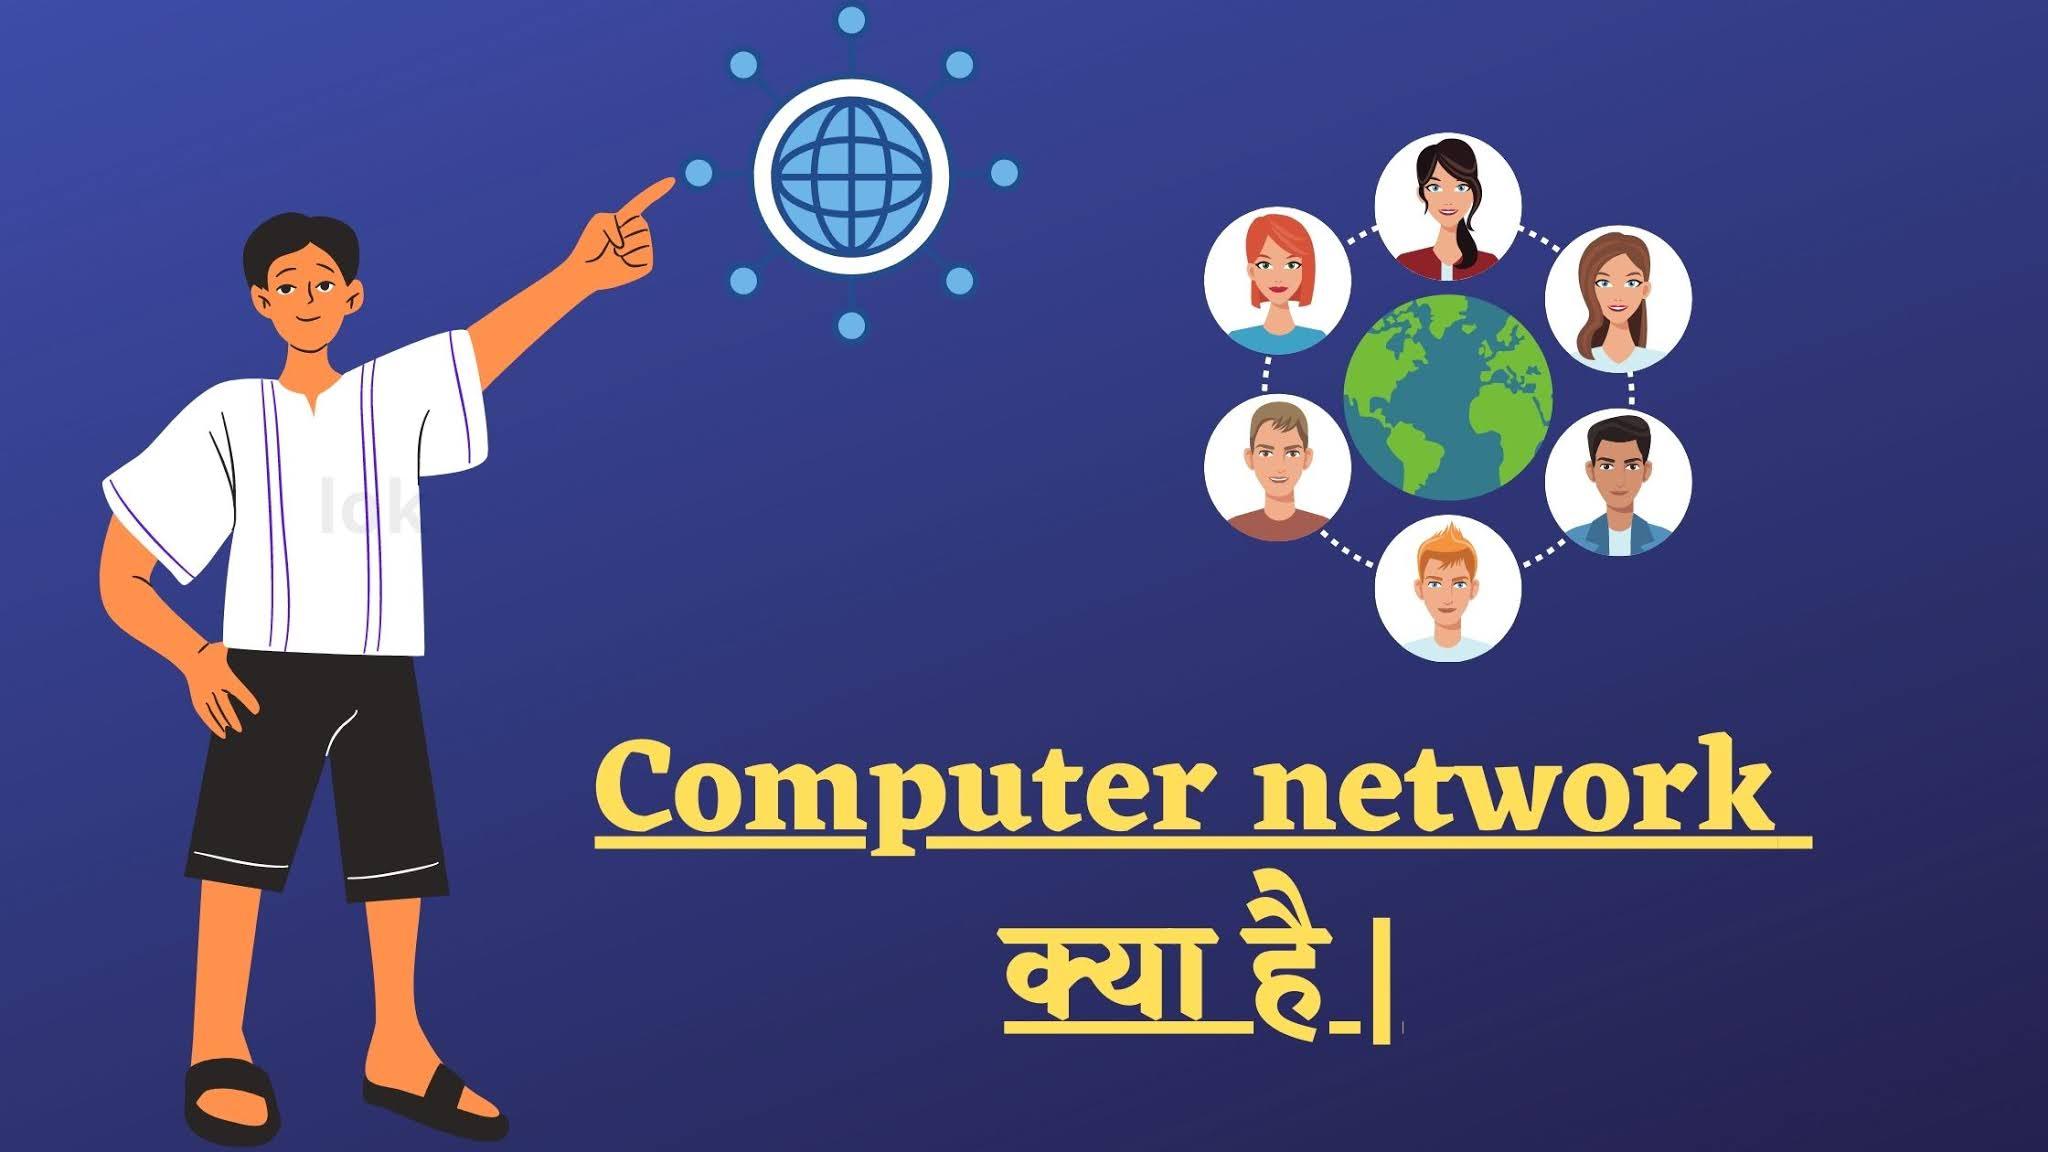 computer network क्या है 2021